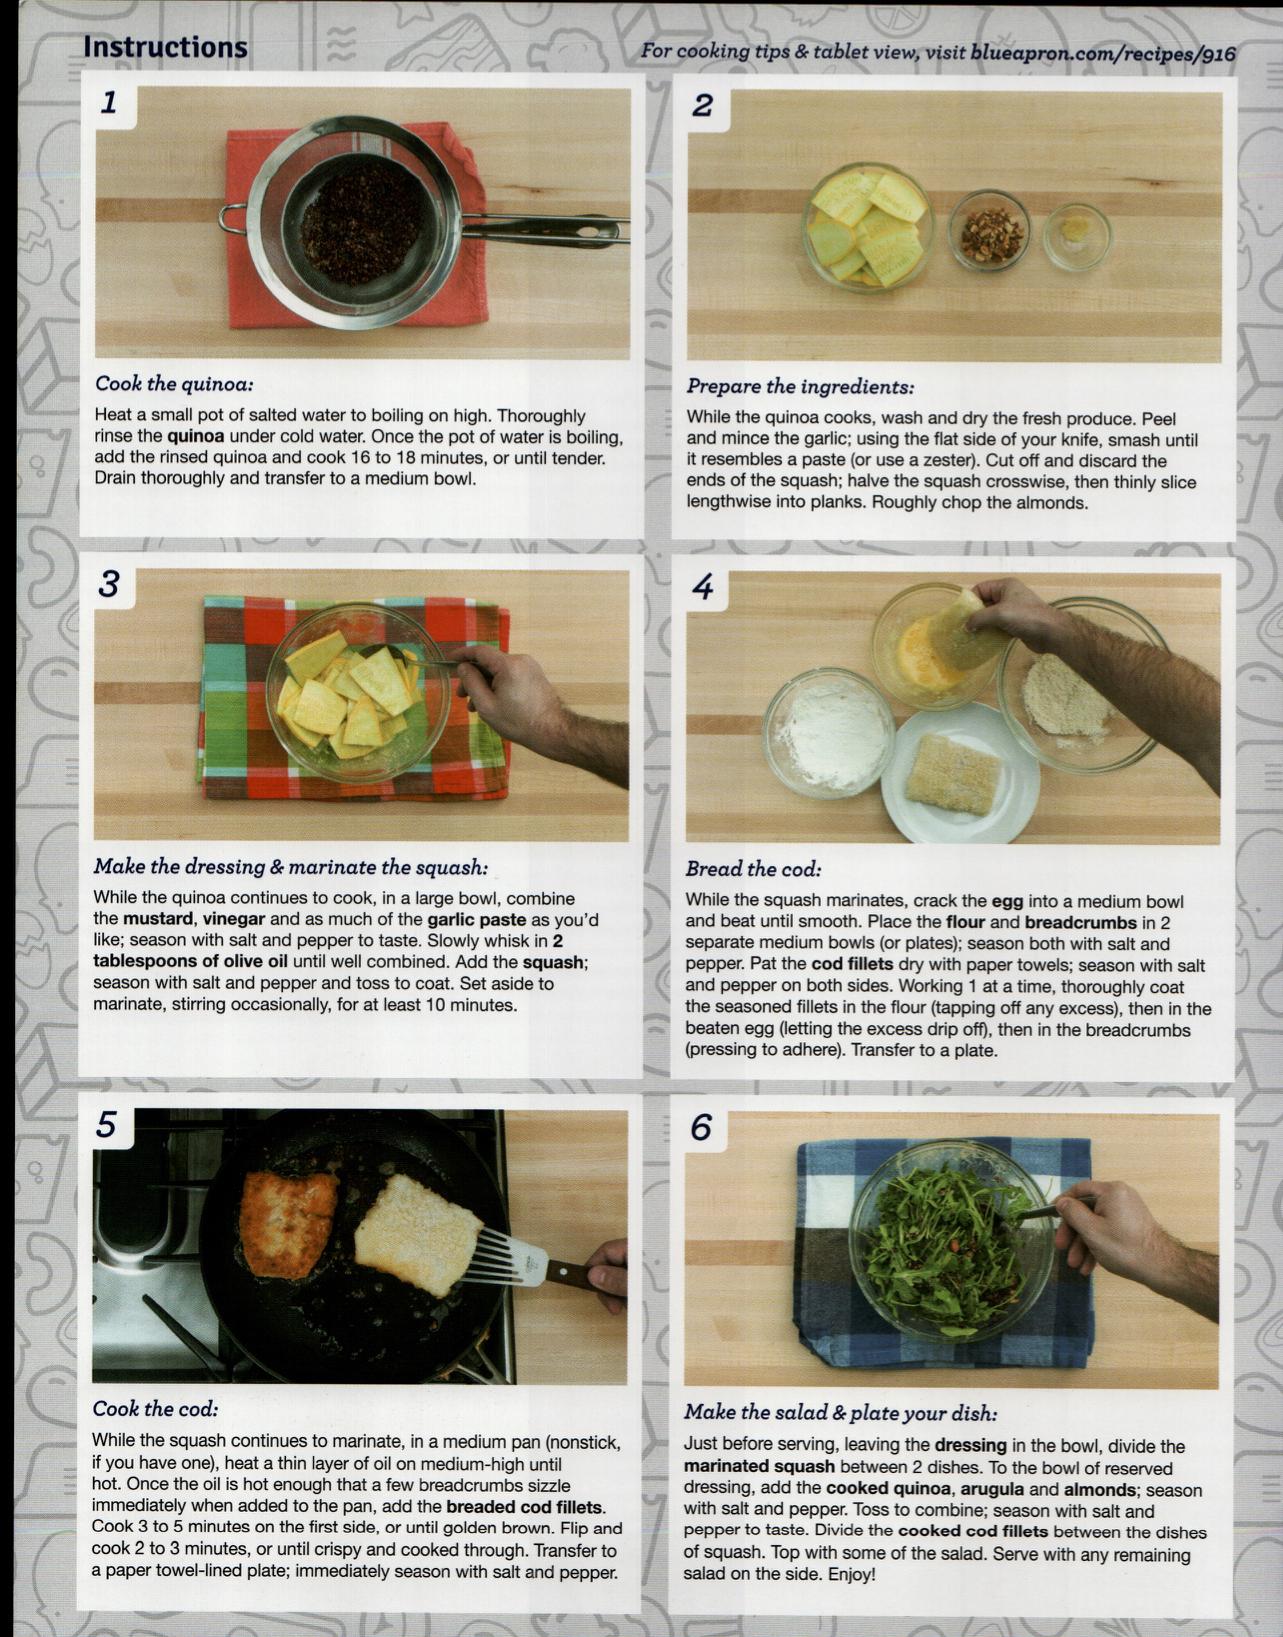 Blue apron olive oil - Blue Apron Yellow Squash Arugula Salad Blue Apron Blueapron Cooking With Adam Cookingwithadam Crispy Cod